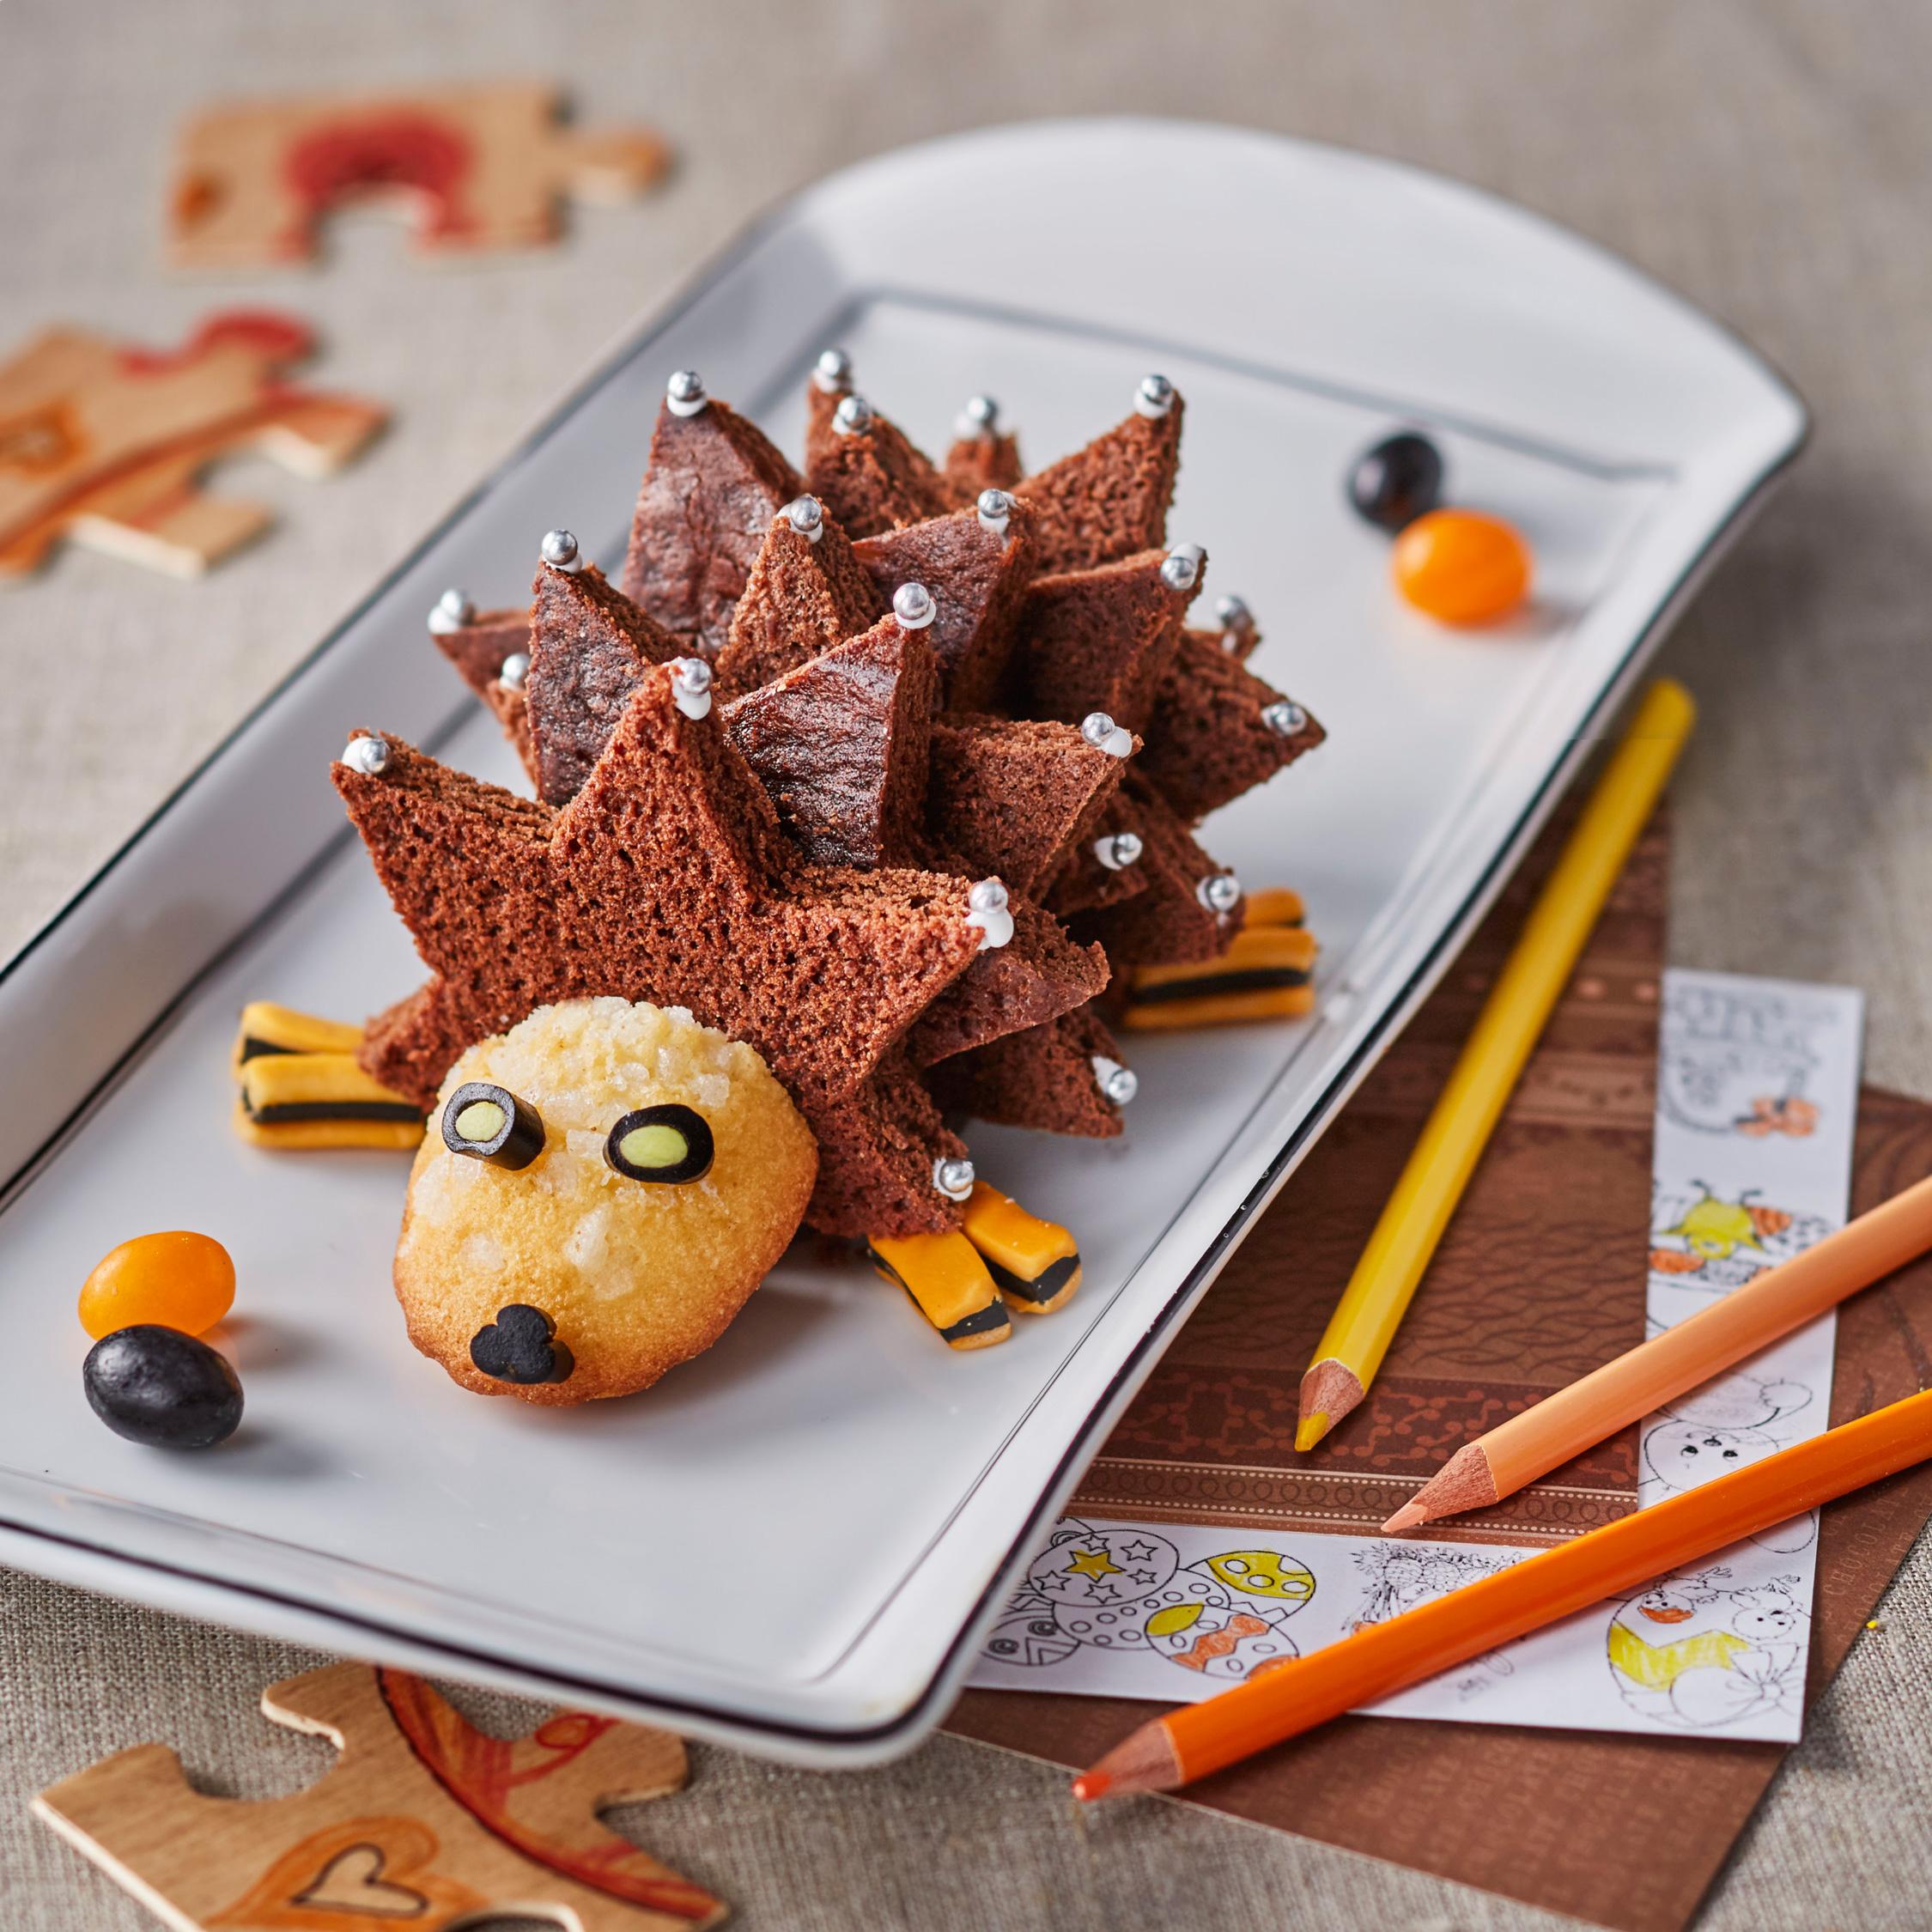 gateau-moelleux-herisson-au-chocolat